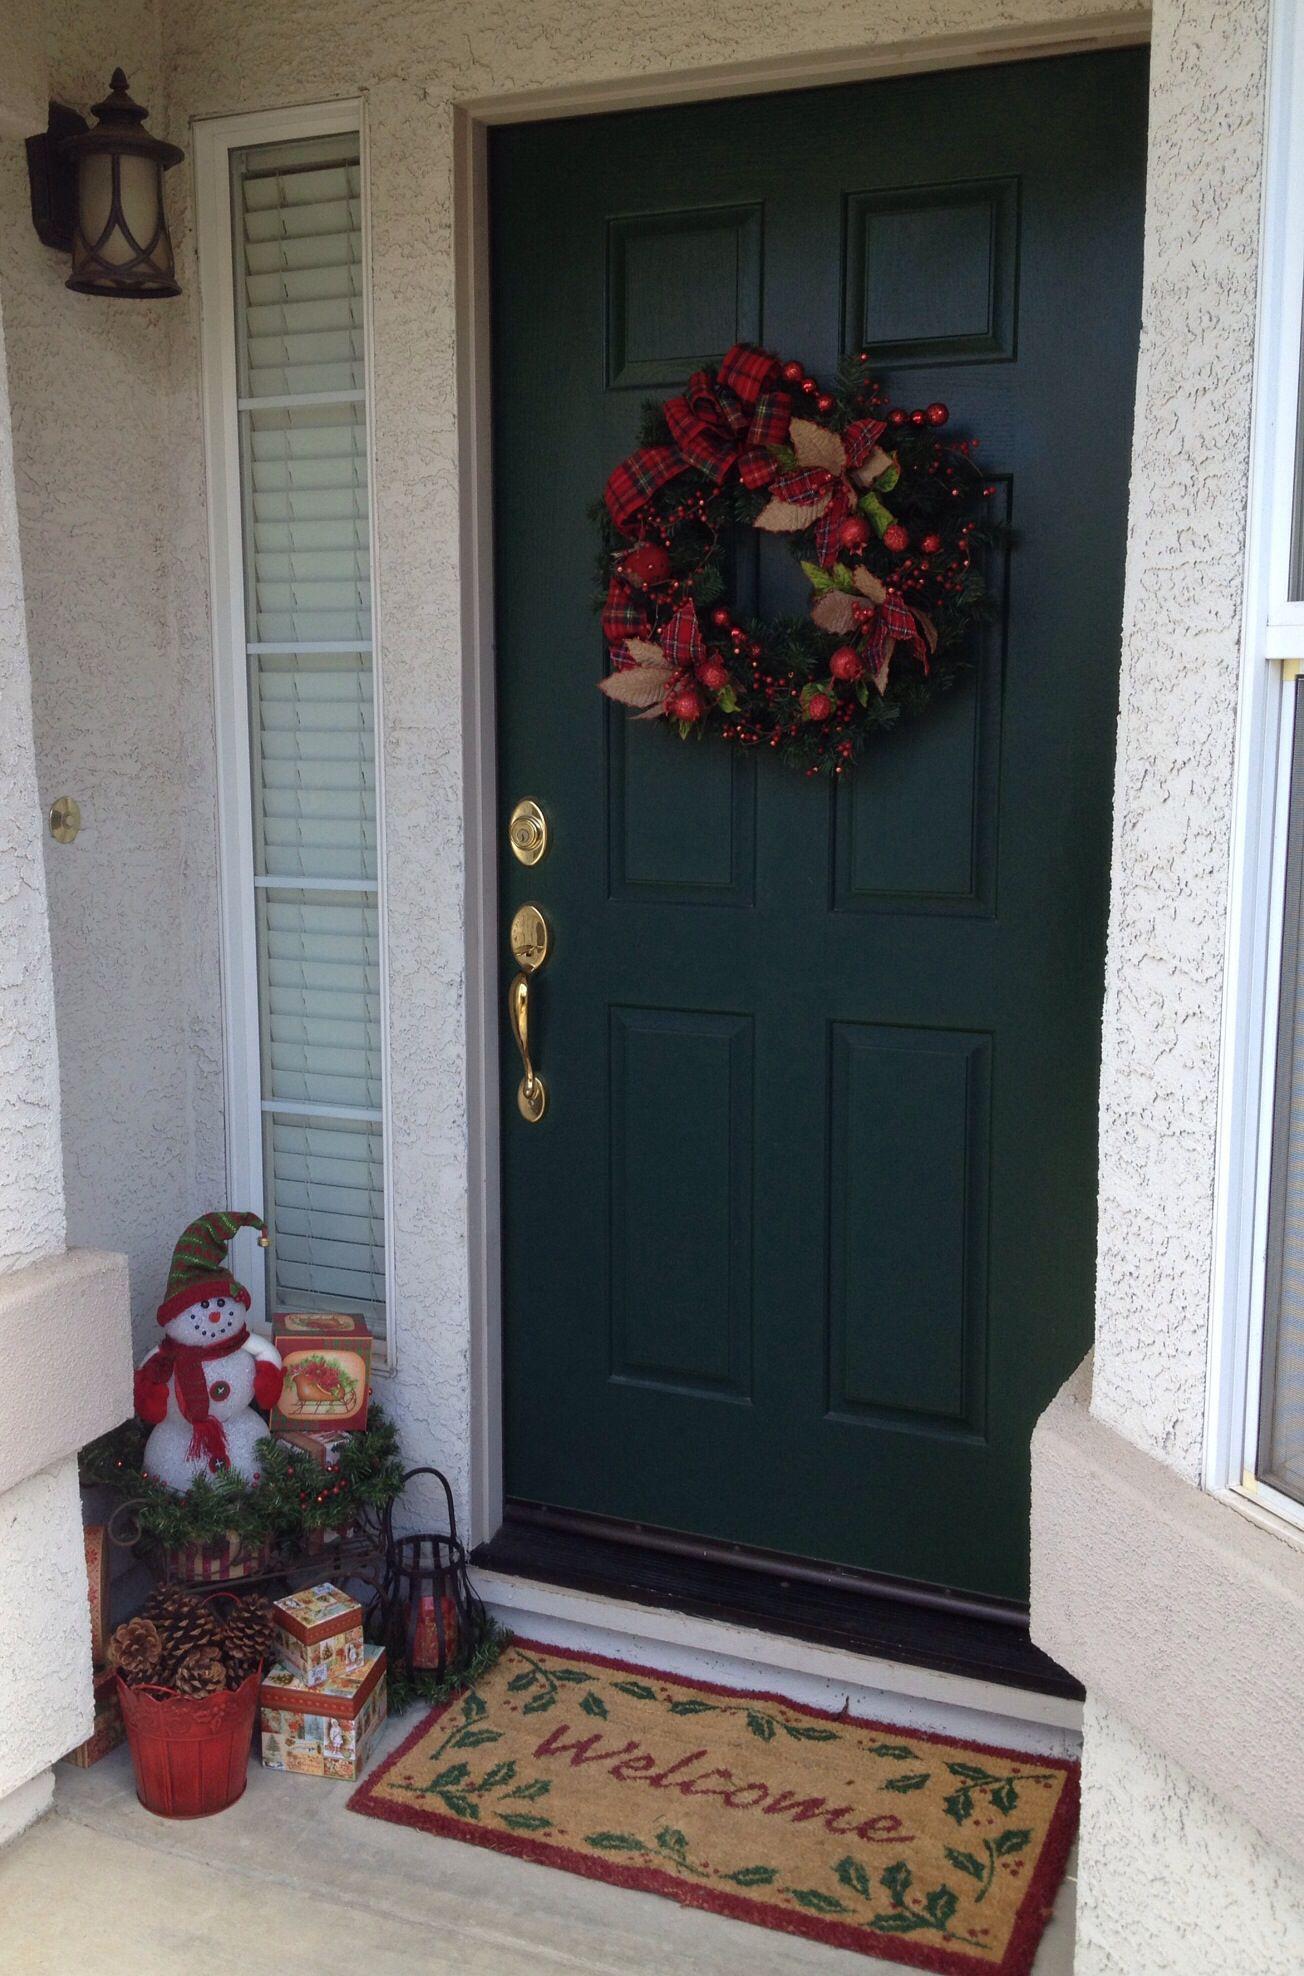 2013 Christmas Front Porch decor